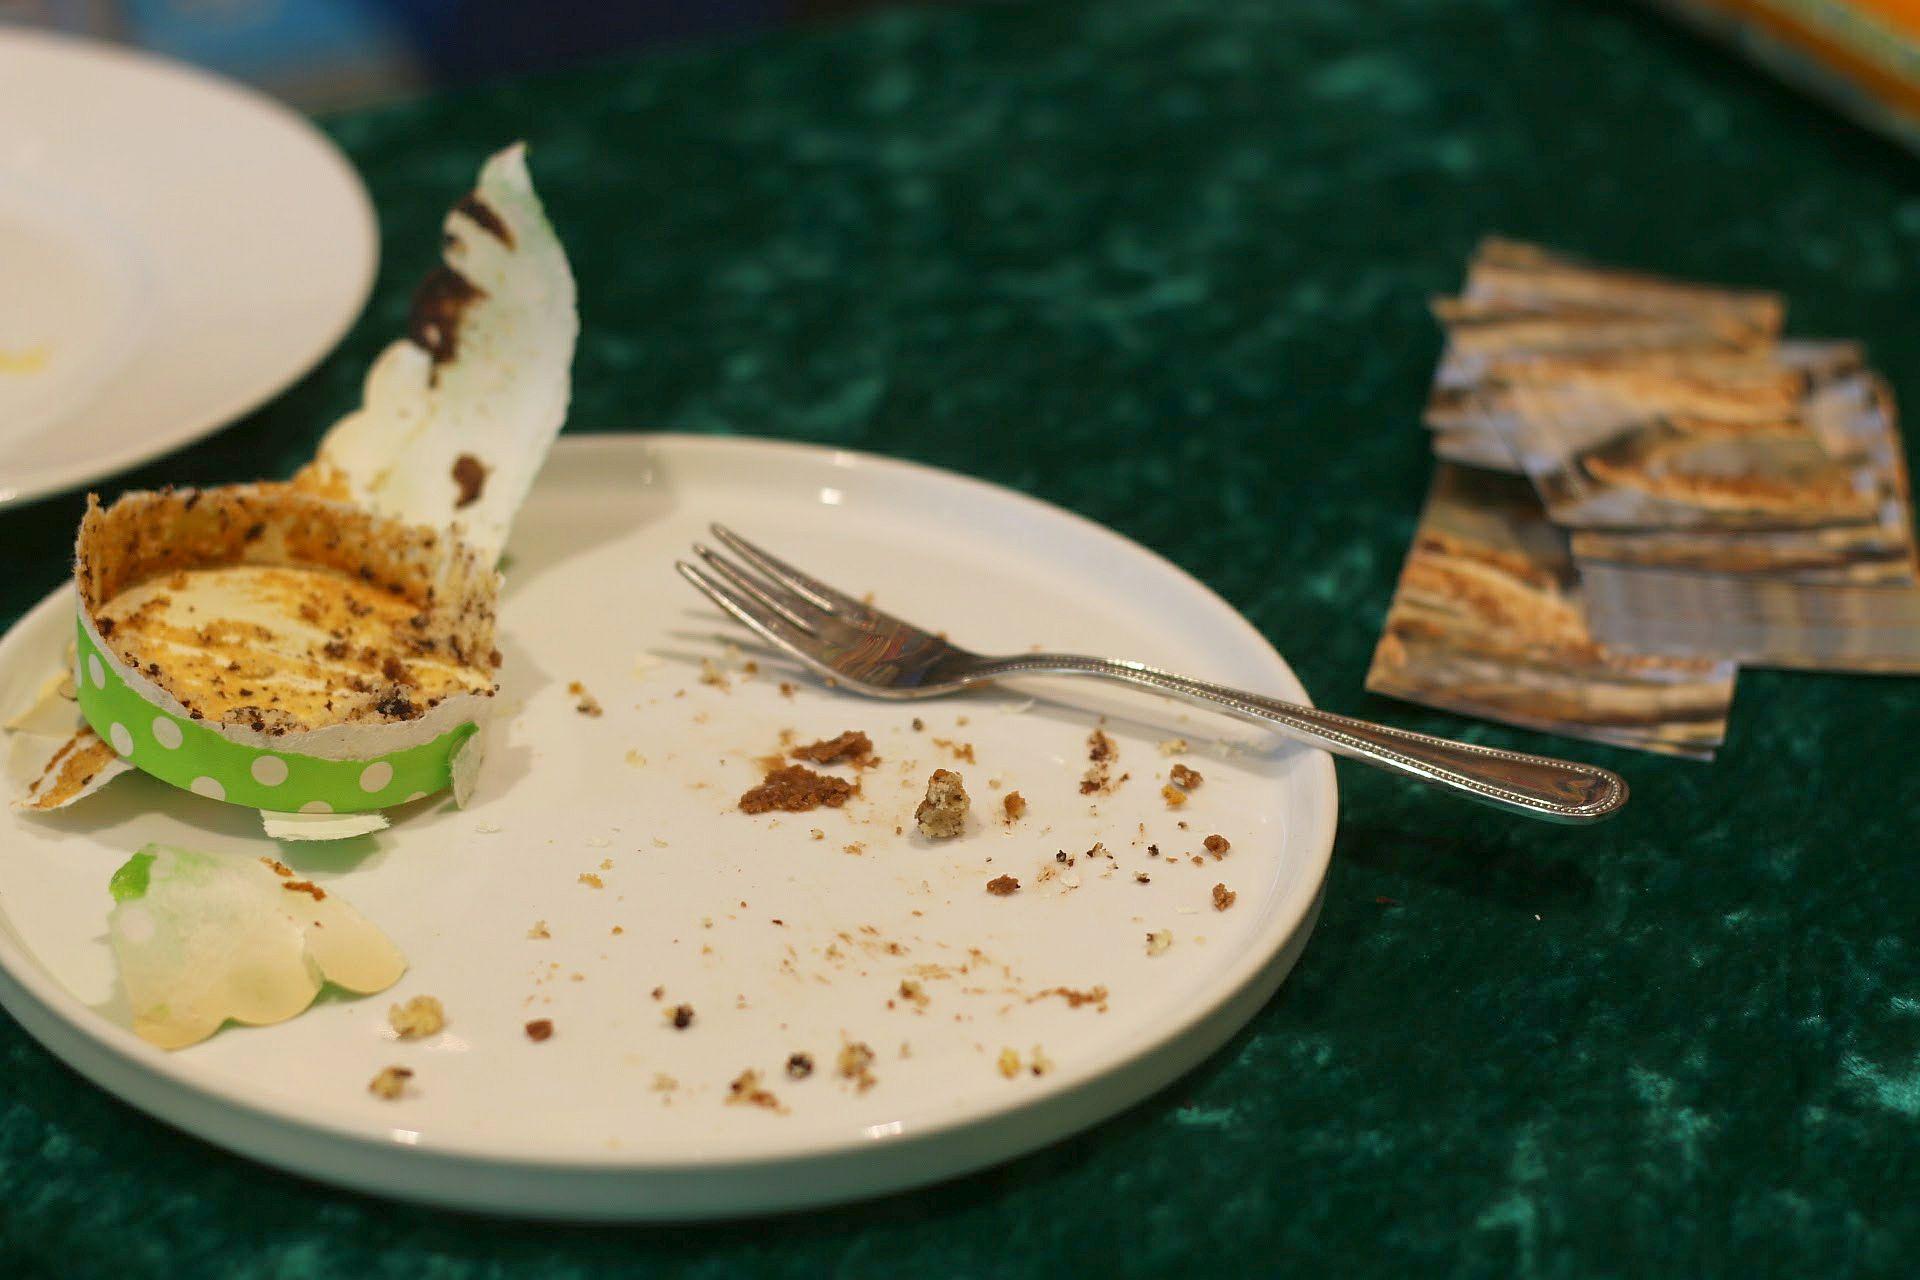 Blogger-Event Visitenkarten Tisch Kuchen Cupcakes Muffins essen Kaffeeklatsch